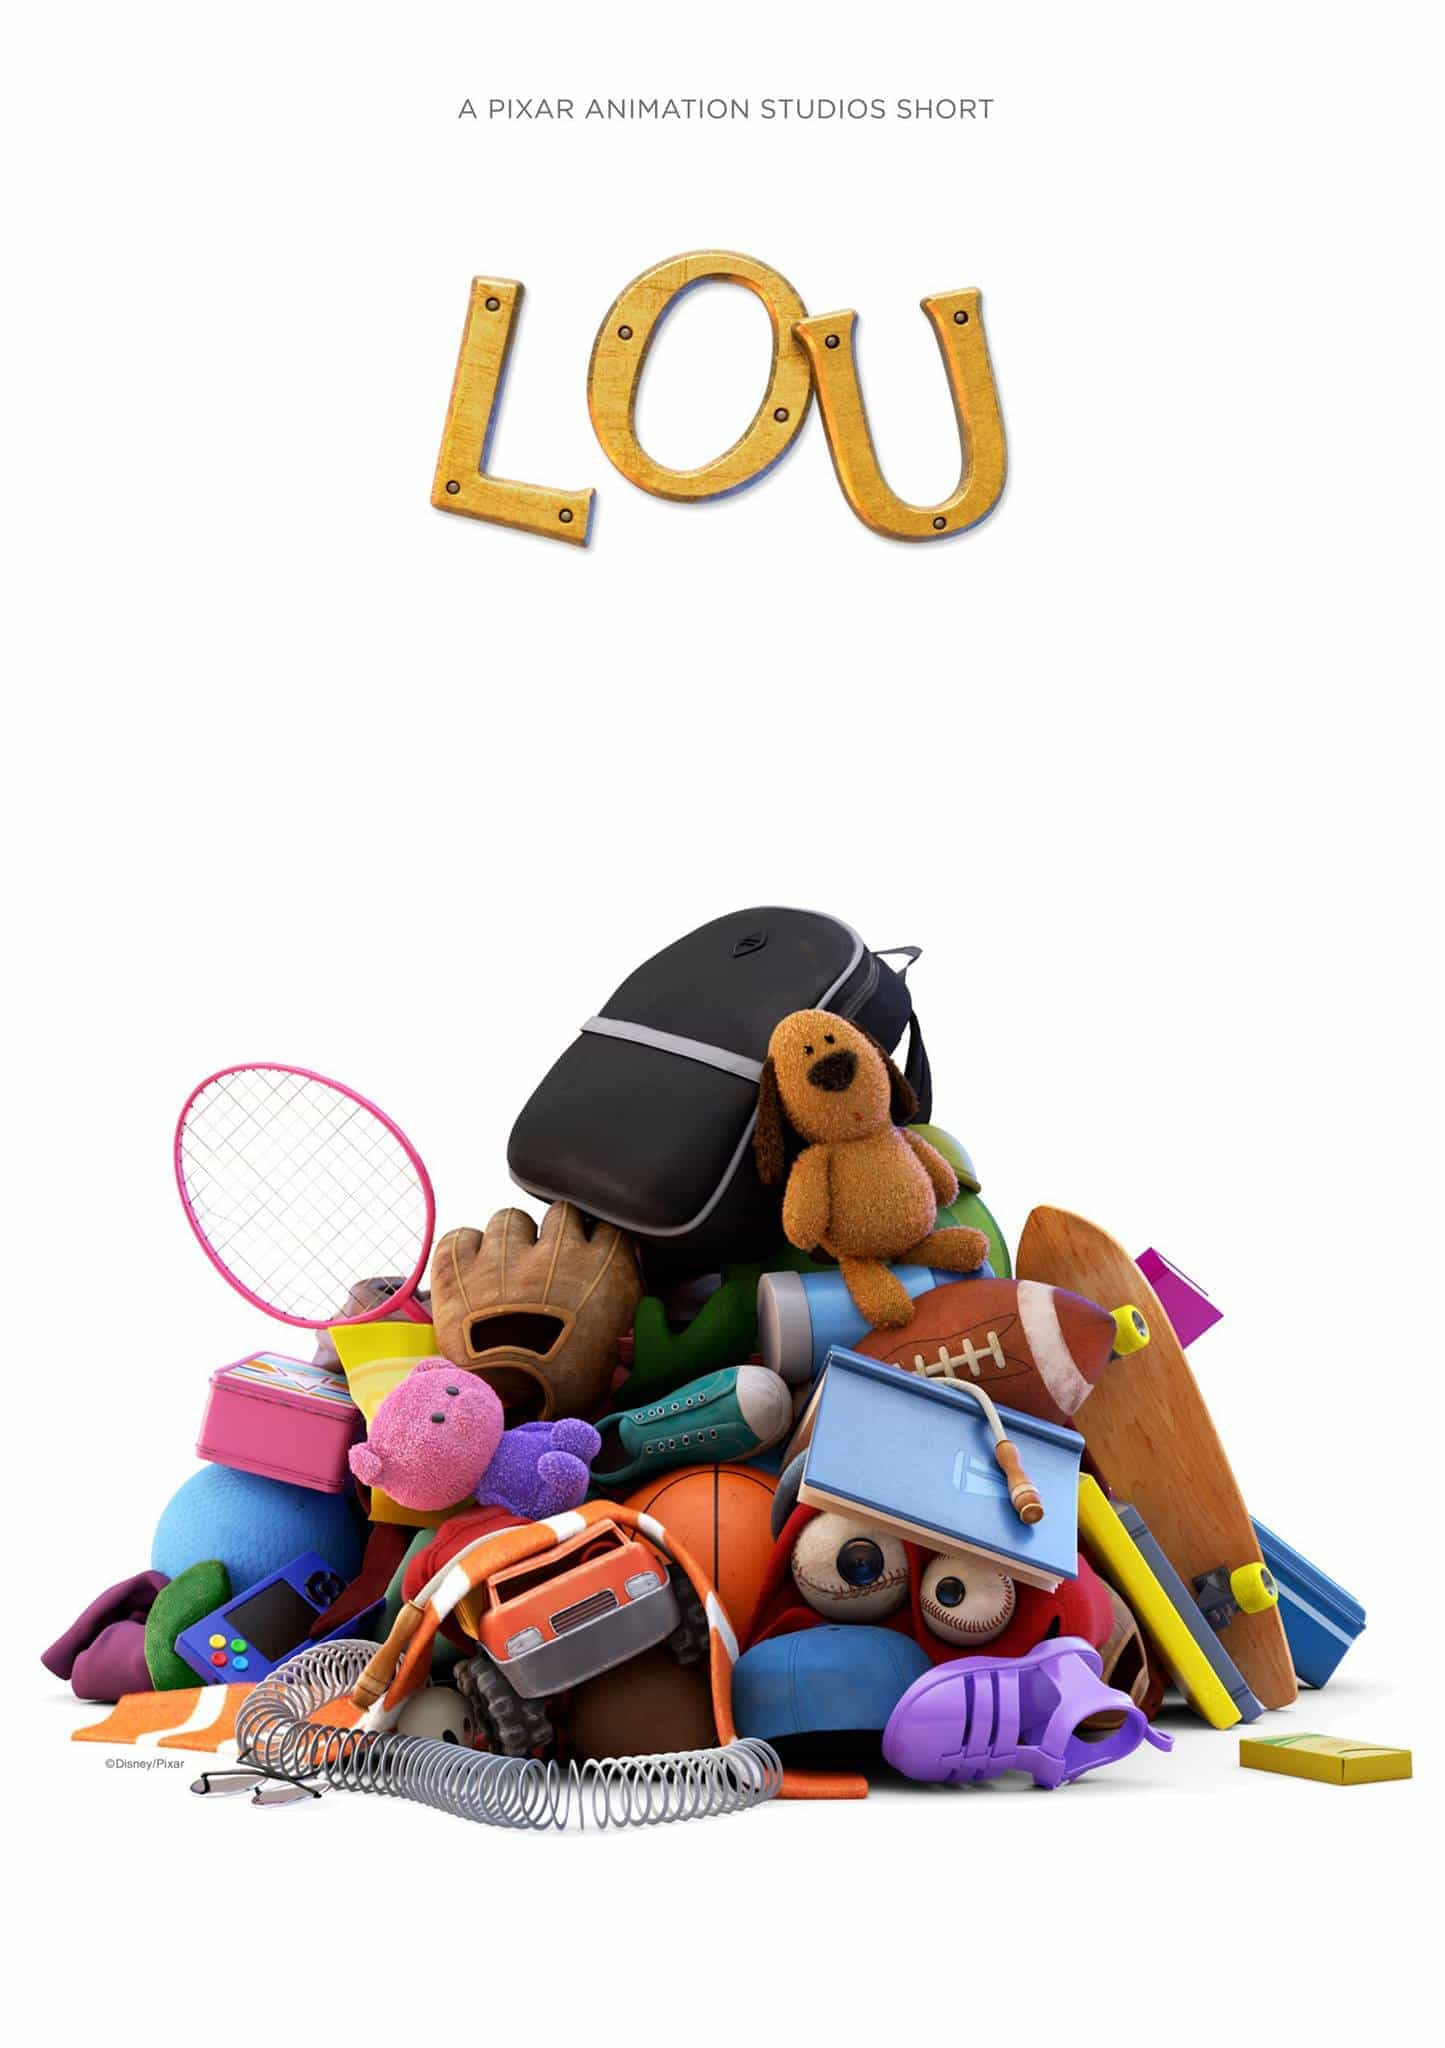 New Pixar Short Lou